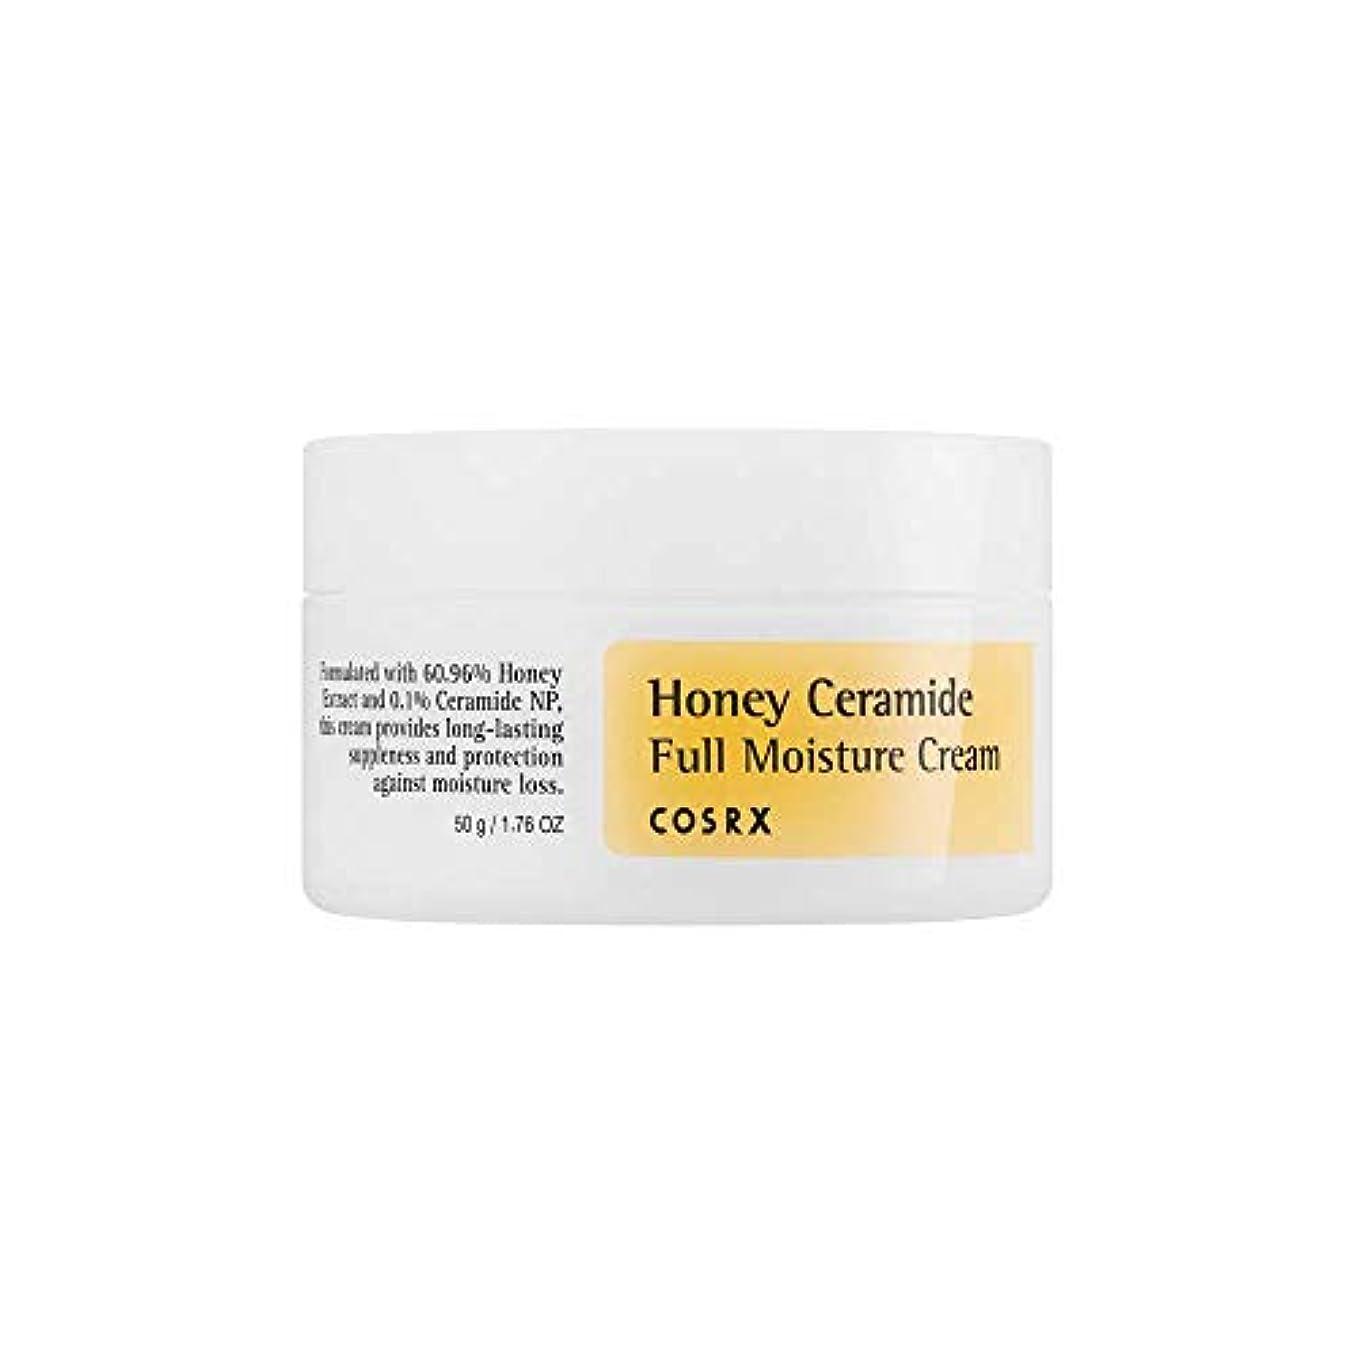 解説保険実験的COSRX Honey Ceramide Full Moisture Cream (並行輸入品)